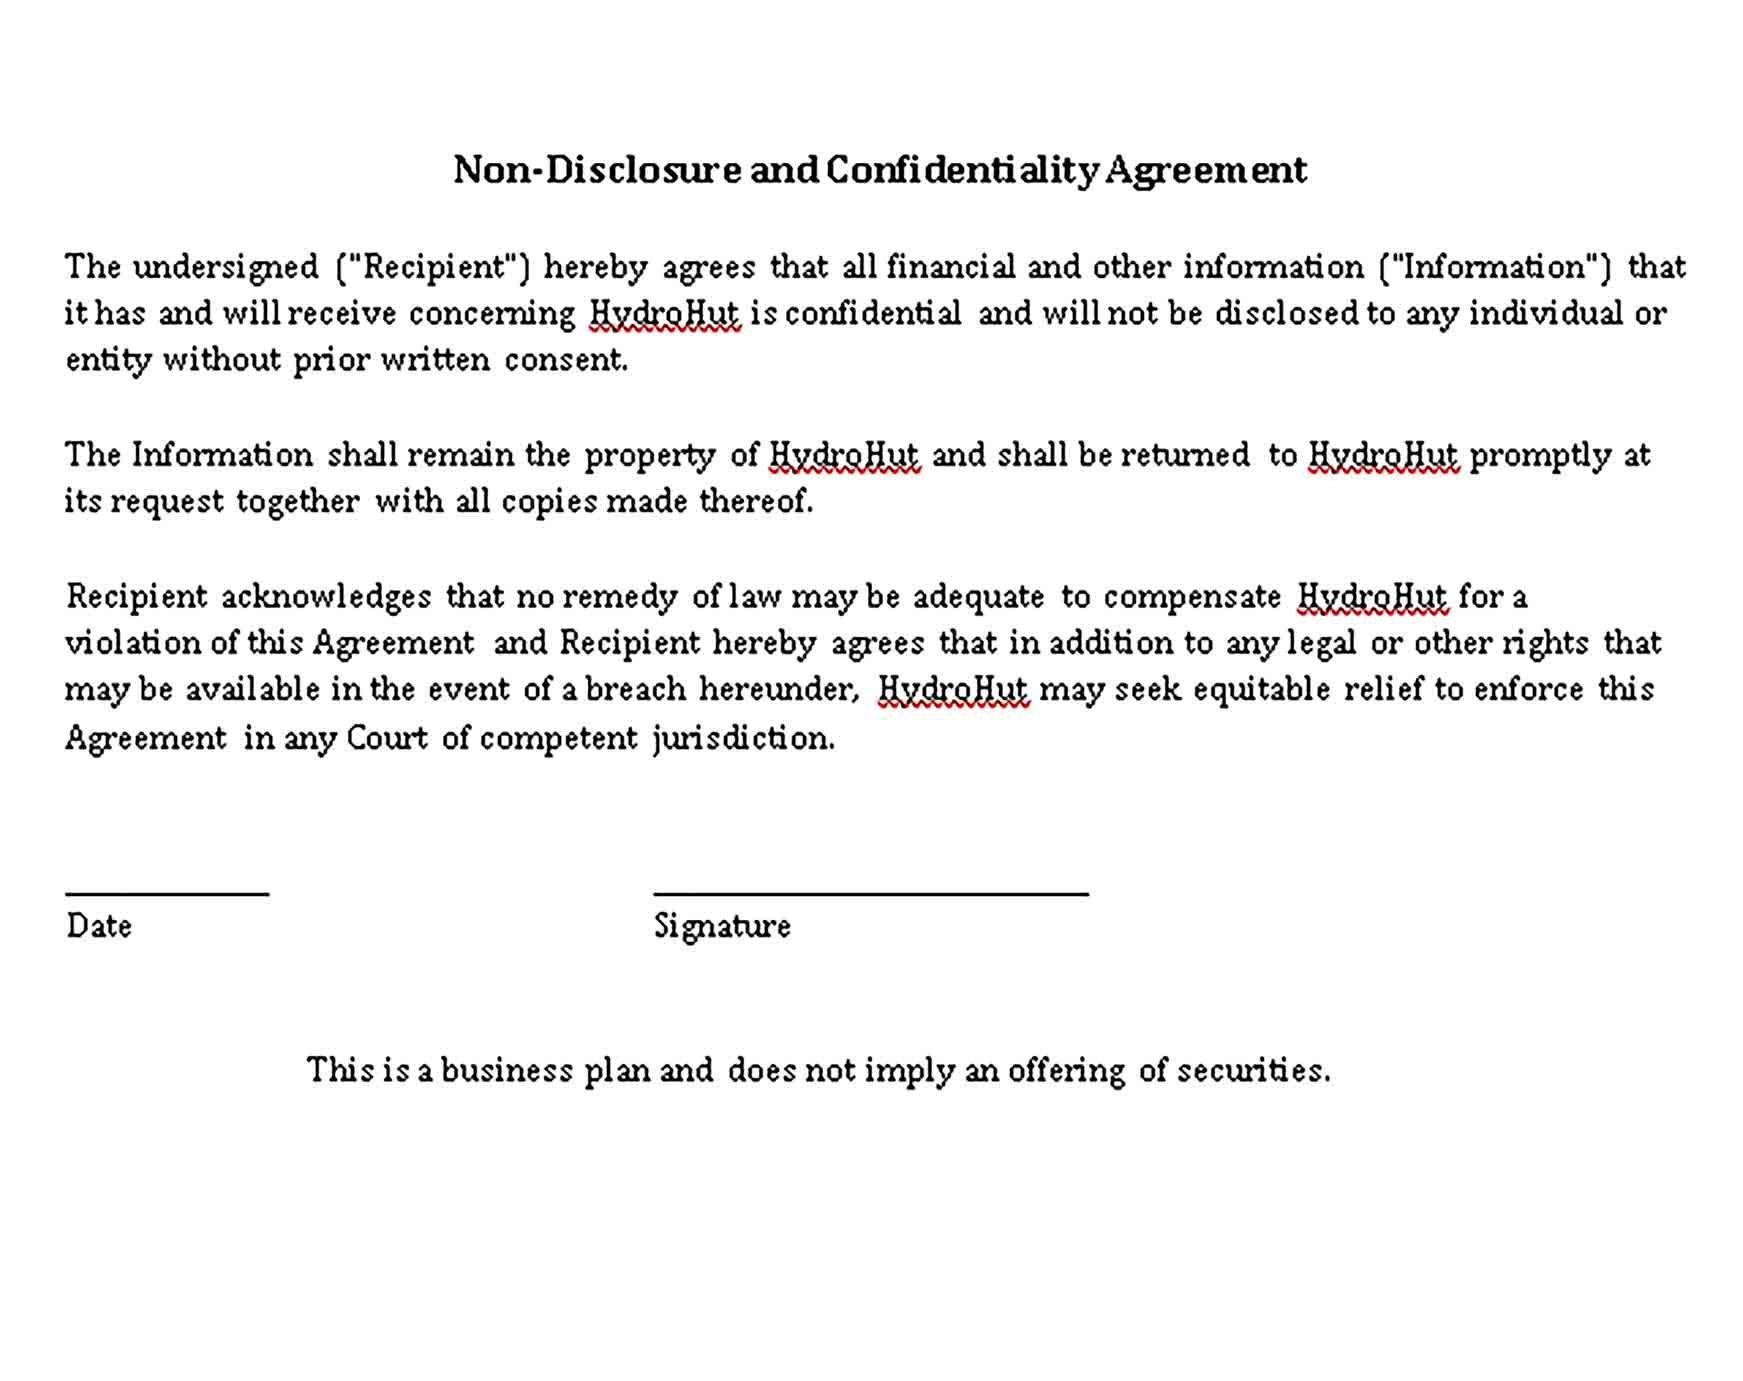 Sample Restaurant Non Disclosure Agreement Template Non Disclosure Agreement Business Template Restaurant Business Plan Simple non disclosure agreement template